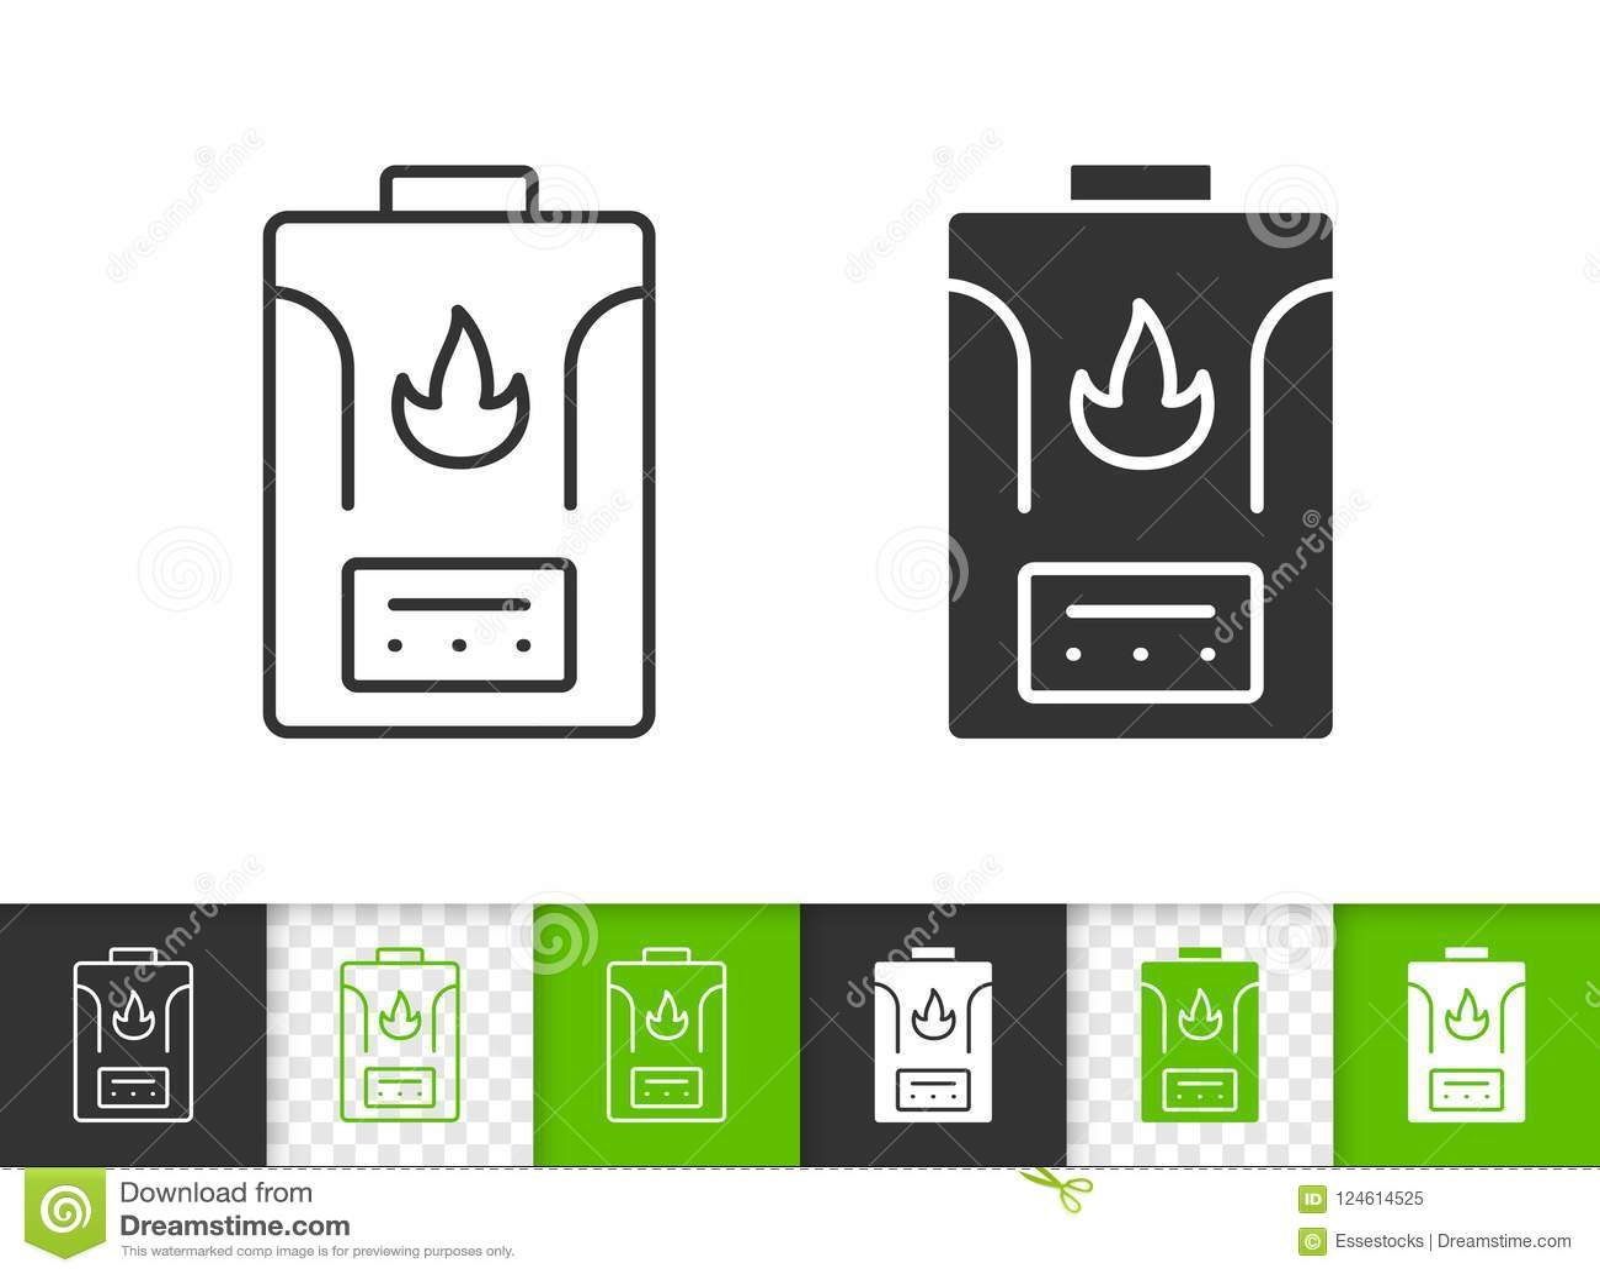 Gas Boiler Simple Black Line Vector Icon Stock Vector - Illustration ...